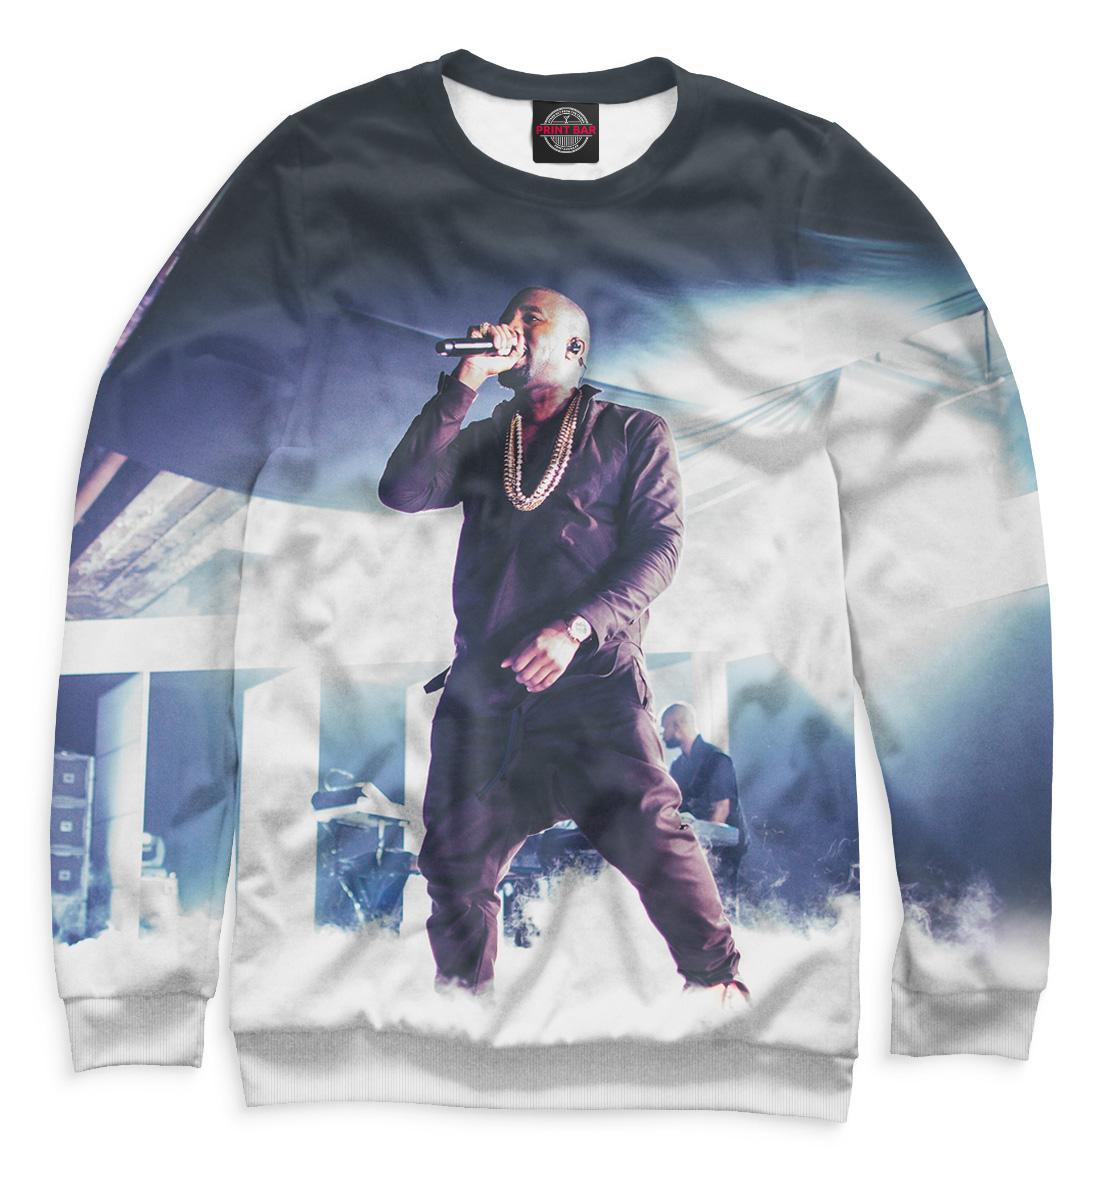 Купить Kanye West, Printbar, Свитшоты, KAW-246601-swi-1